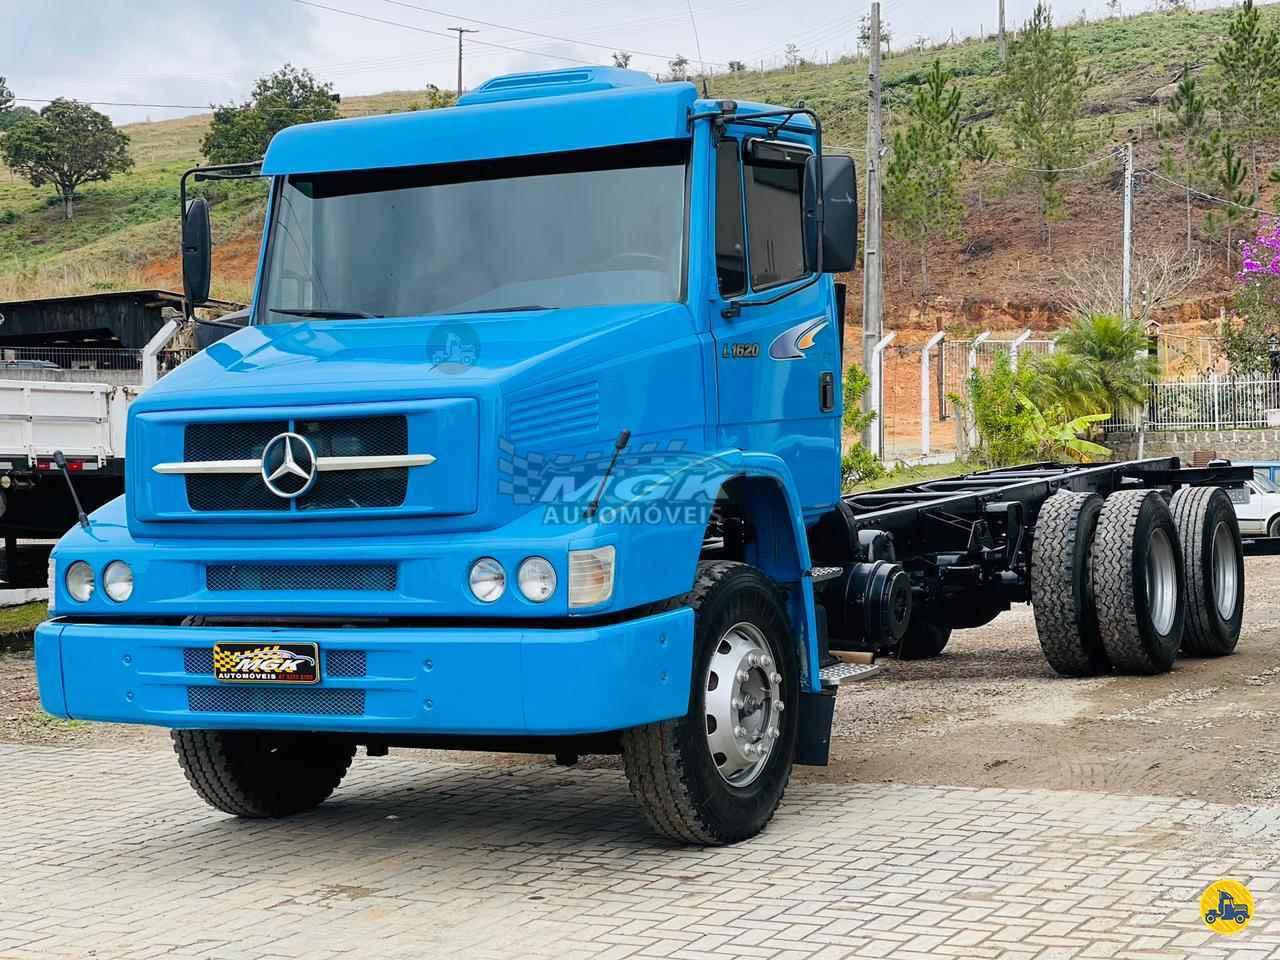 CAMINHAO MERCEDES-BENZ MB 1620 Carga Seca Truck 6x2 MGK Automóveis IBIRAMA SANTA CATARINA SC